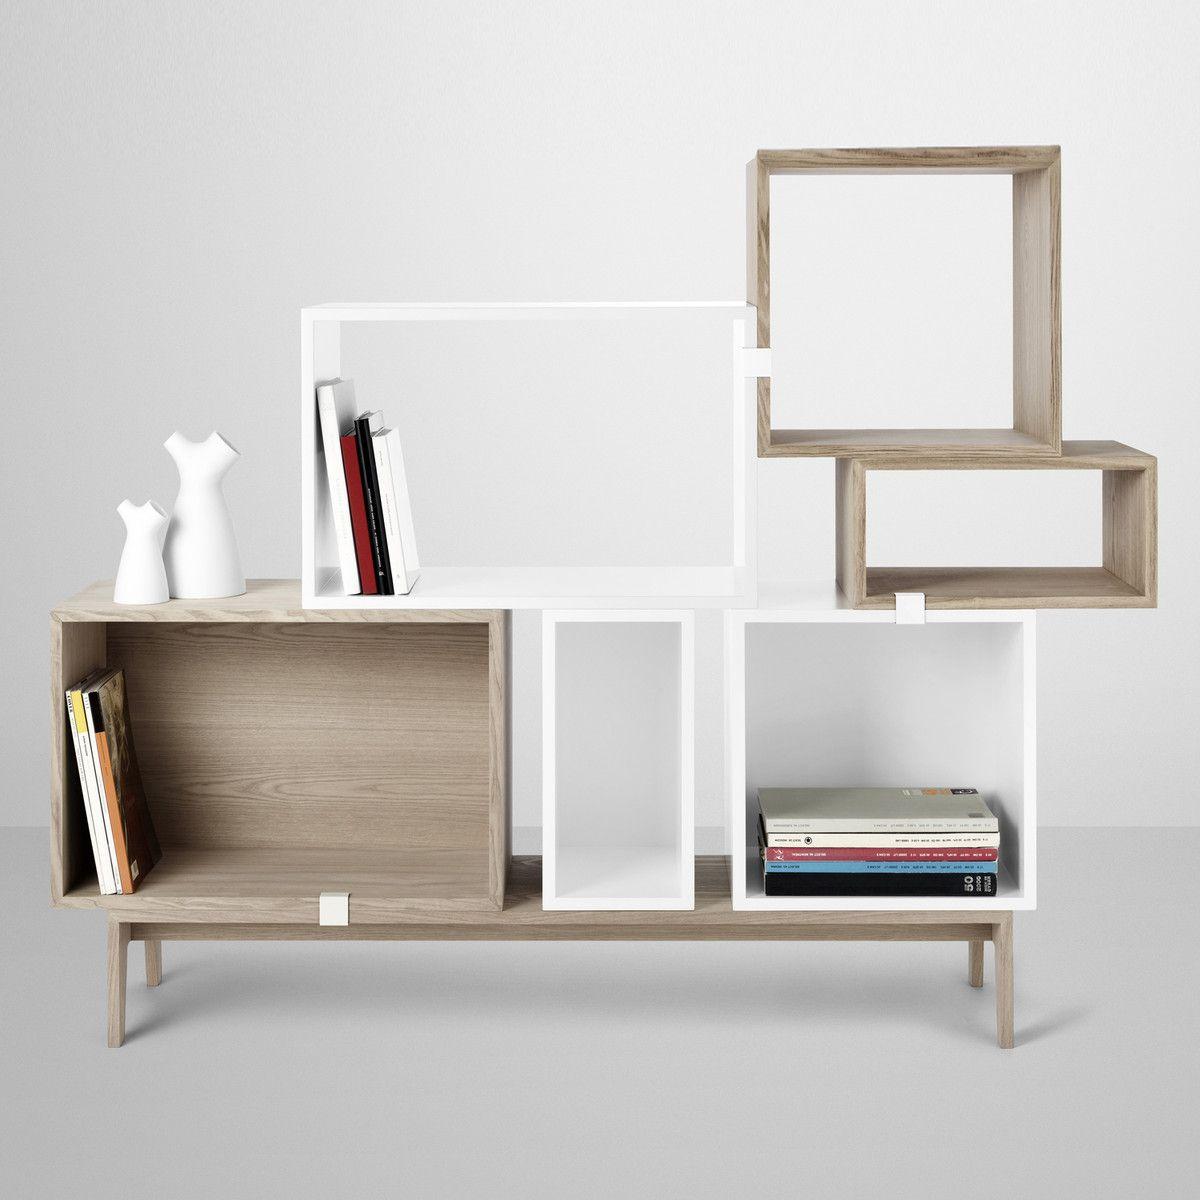 Mini Stacked Shelf System by Muuto | Box regale, Regalsystem